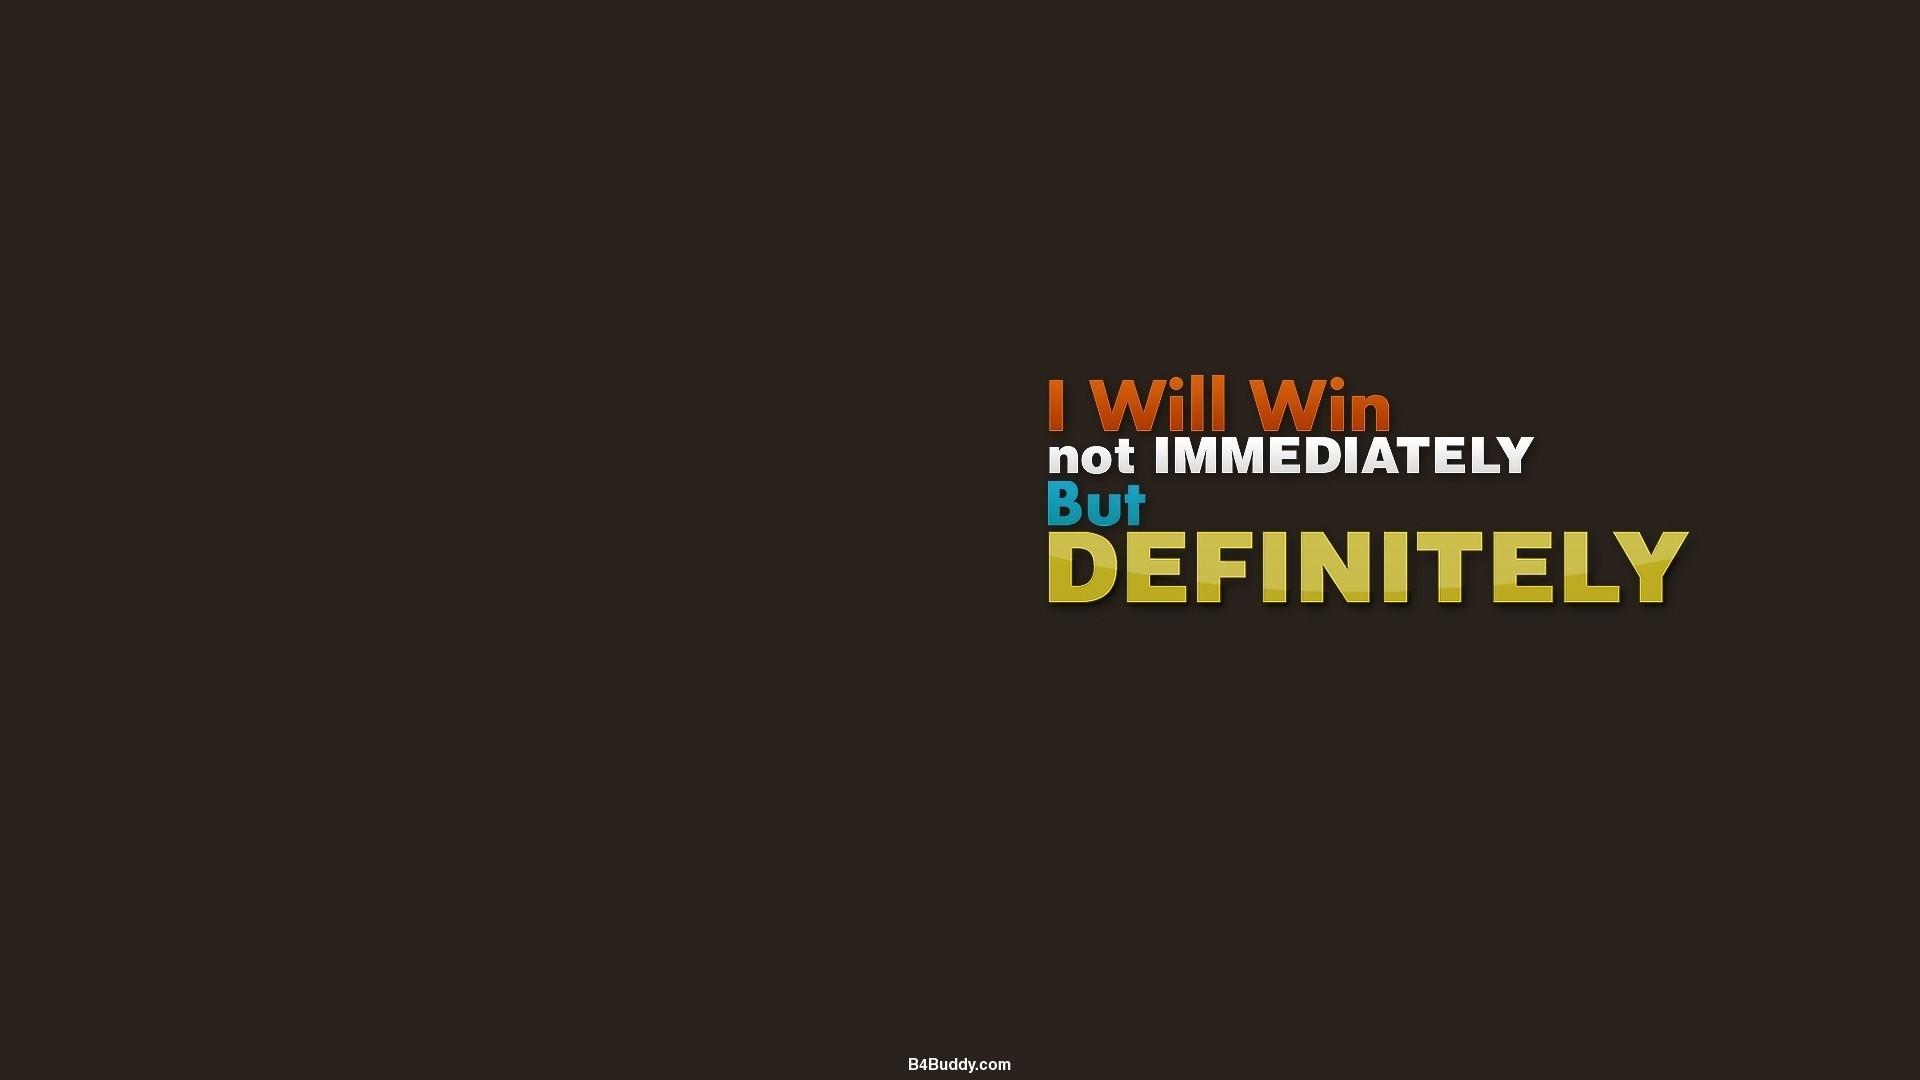 Motivational Desktop Wallpaper (68+ images)